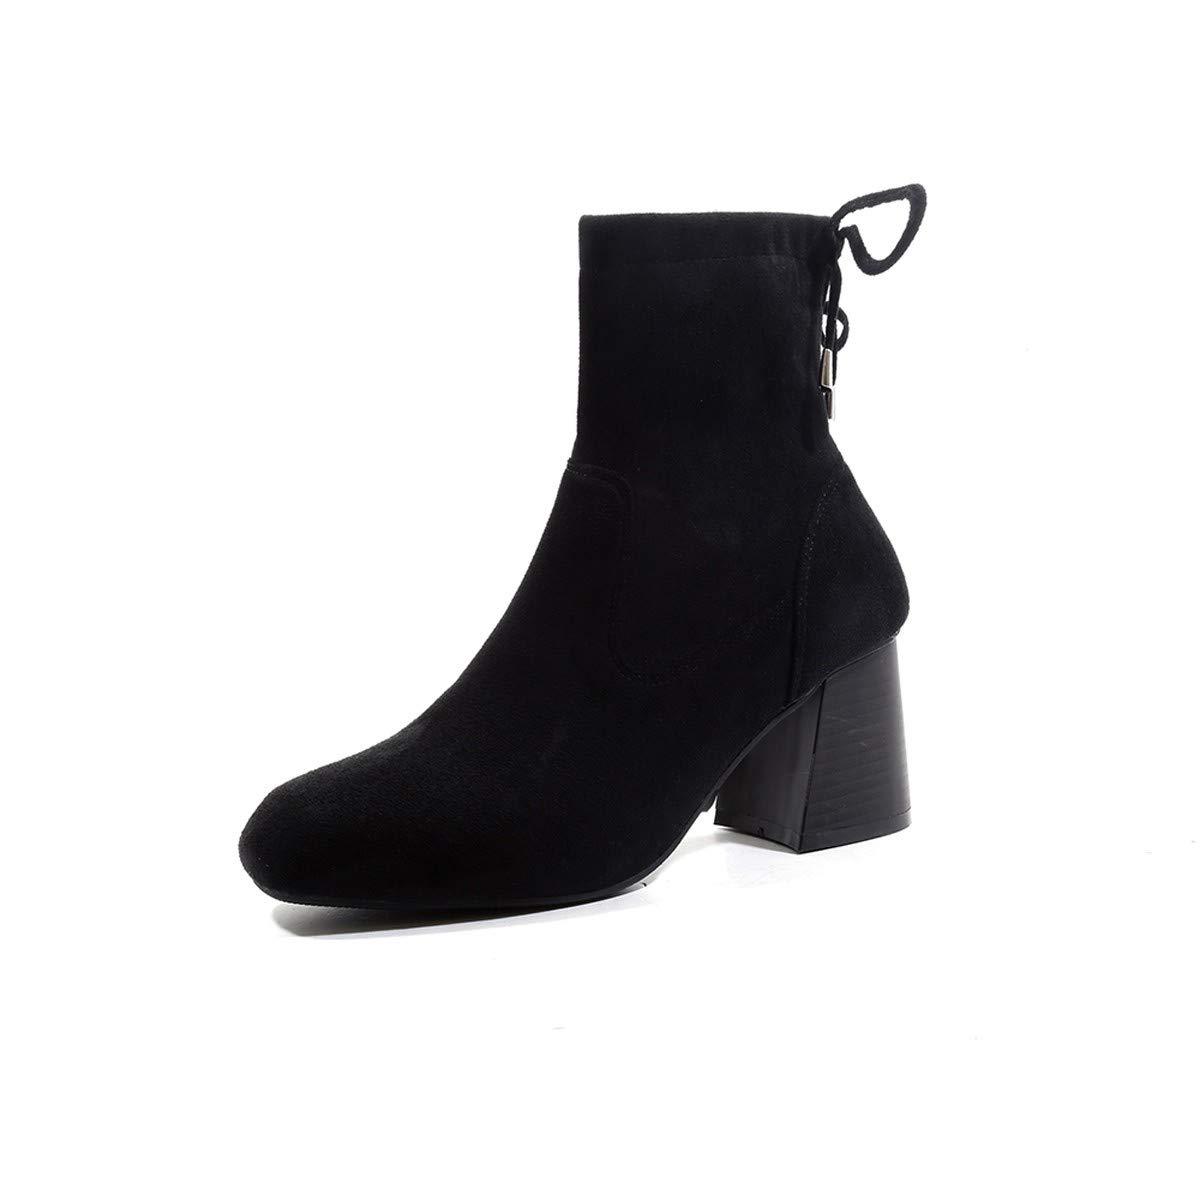 LBTSQ-Platz Kopf Gummi Stiefel Frauen Schuhe Stiefel Pumps Stiefel 7Cm Skinny Mode.